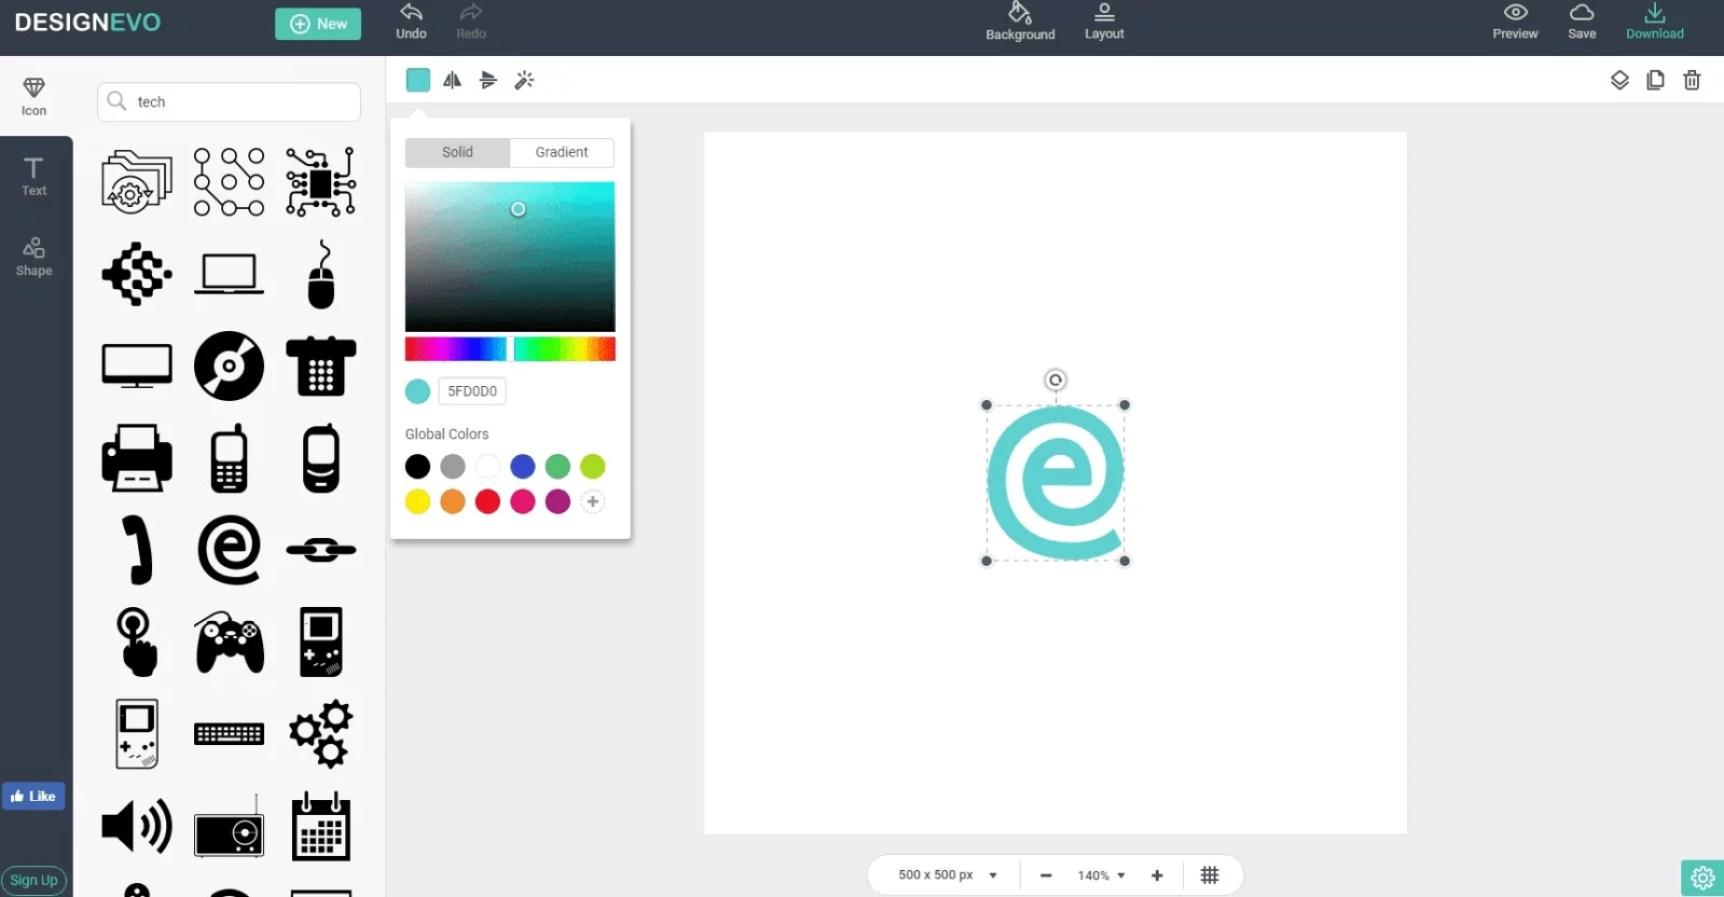 word image 1 - Make Professional Logos Online with DesignEvo Logo Maker